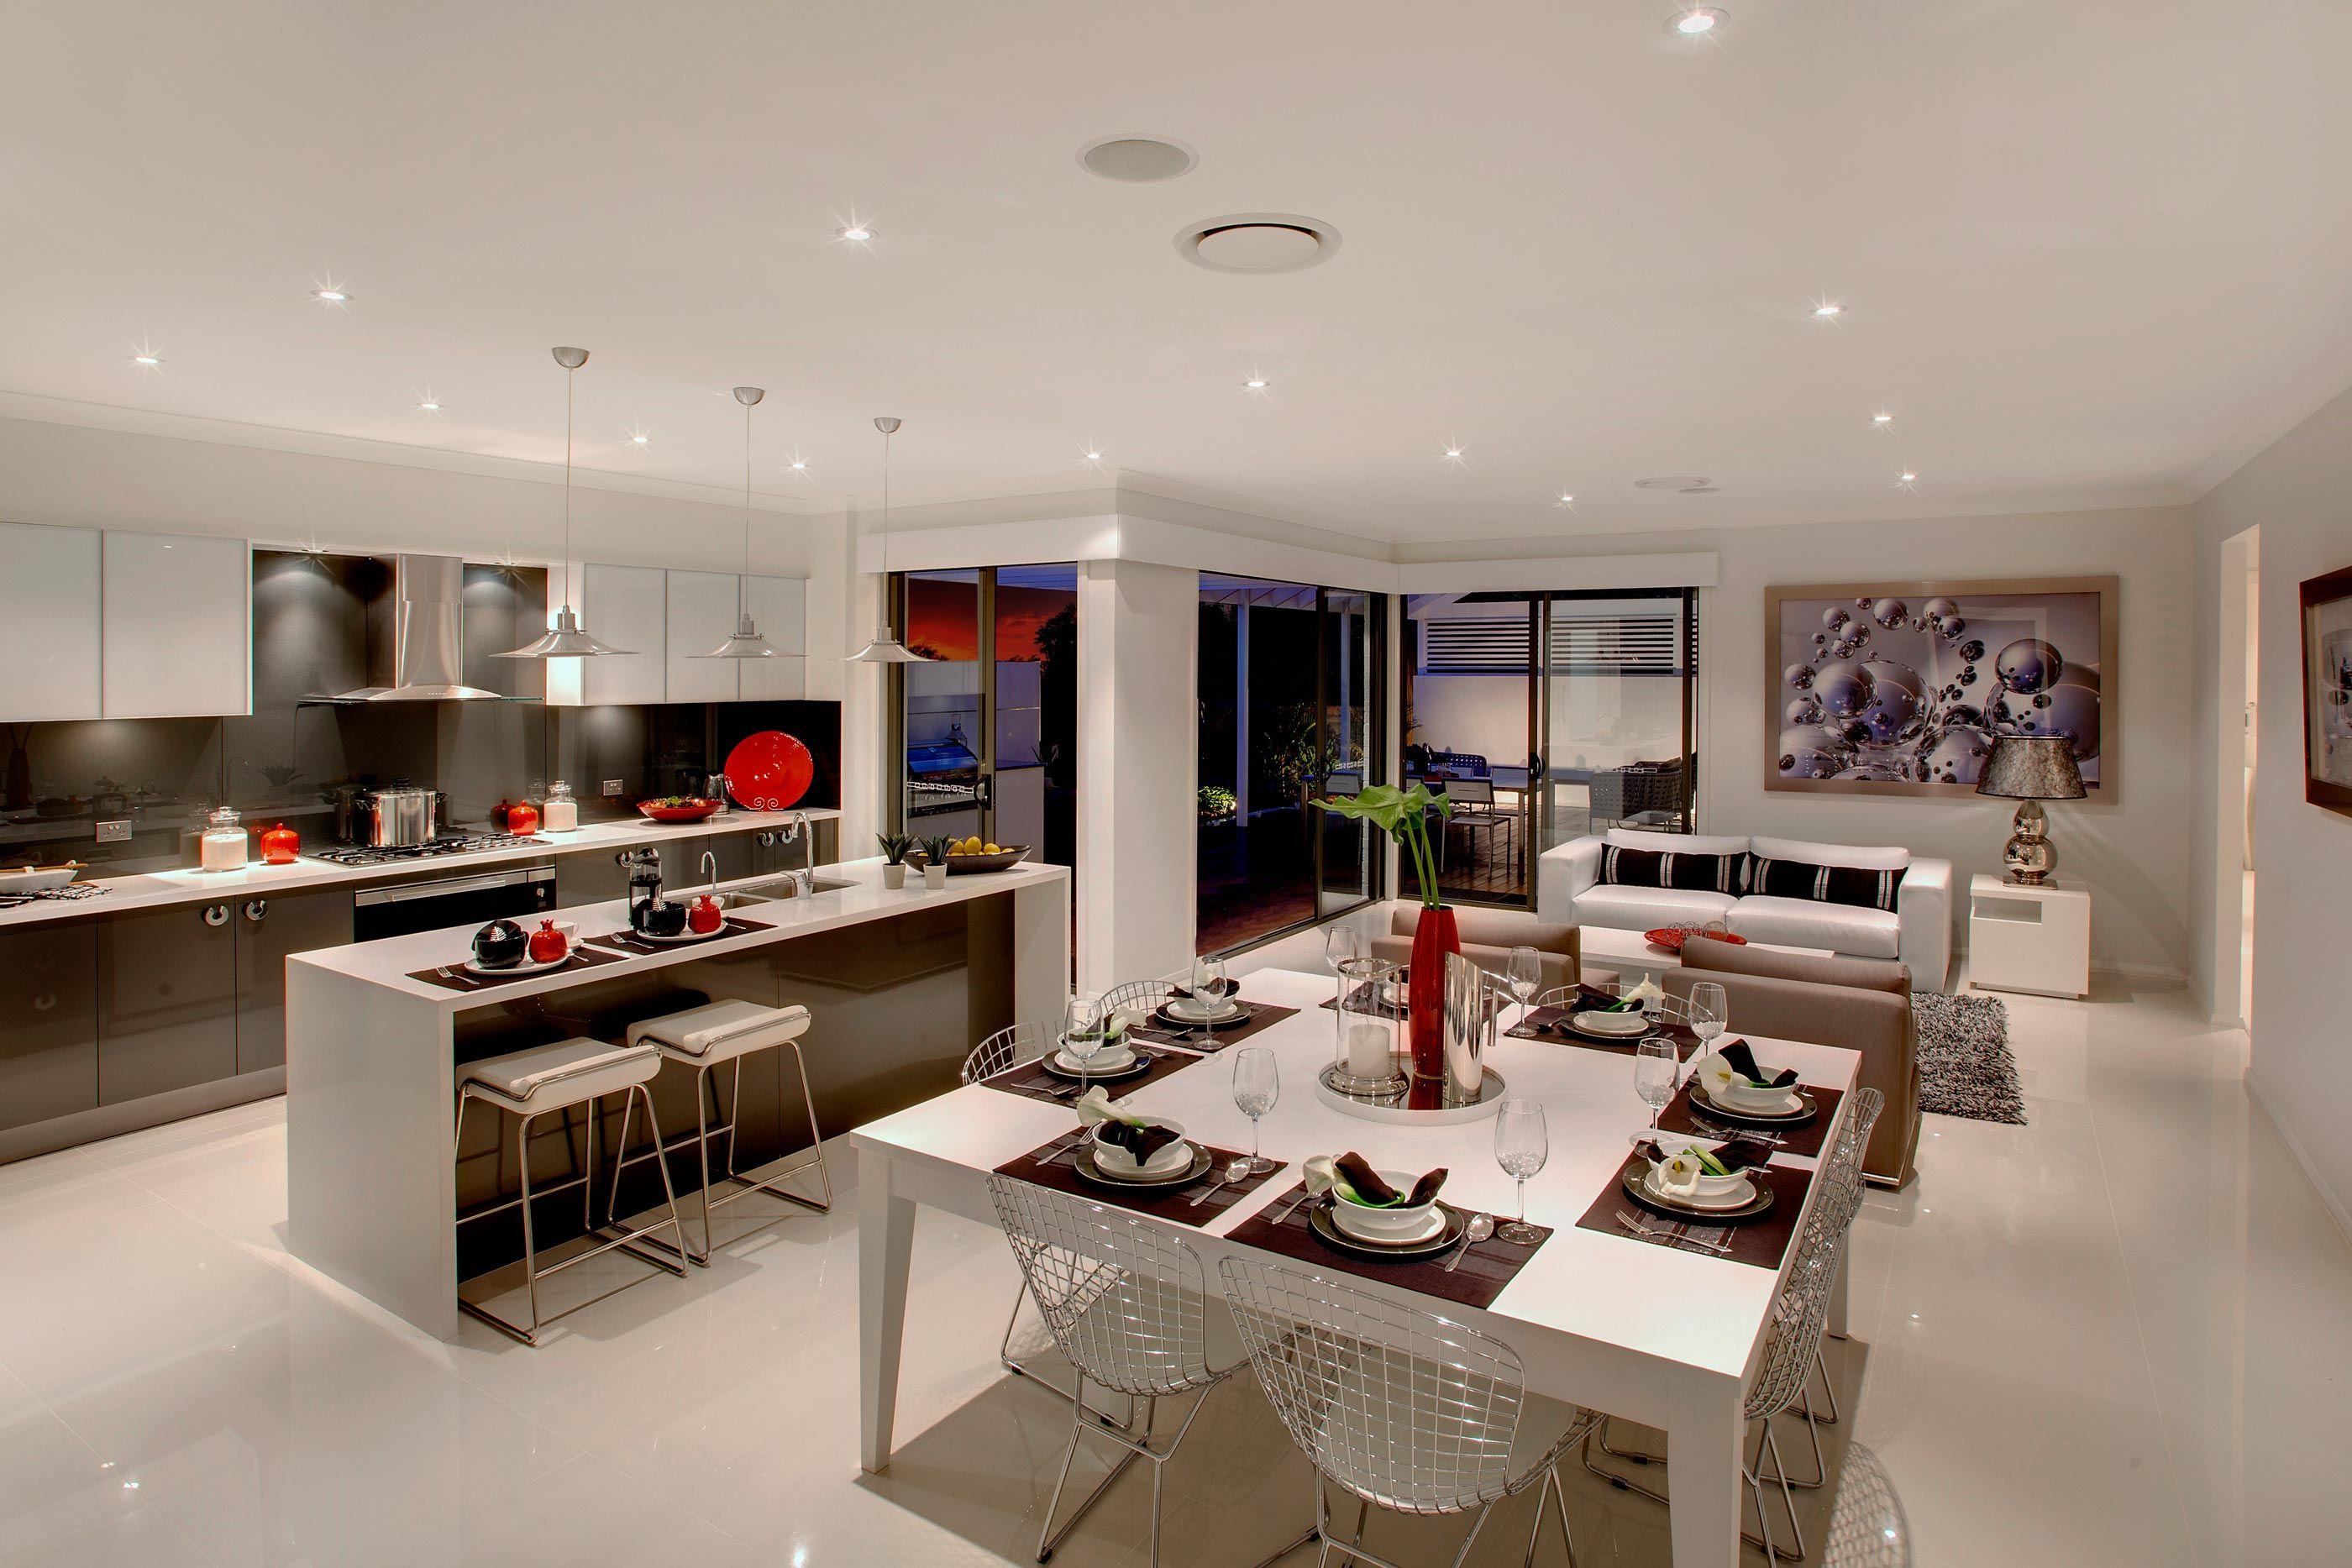 The Entertainer New Home Design Mcdonald Jones Homes New Home Designs House Design Mcdonald Jones Homes